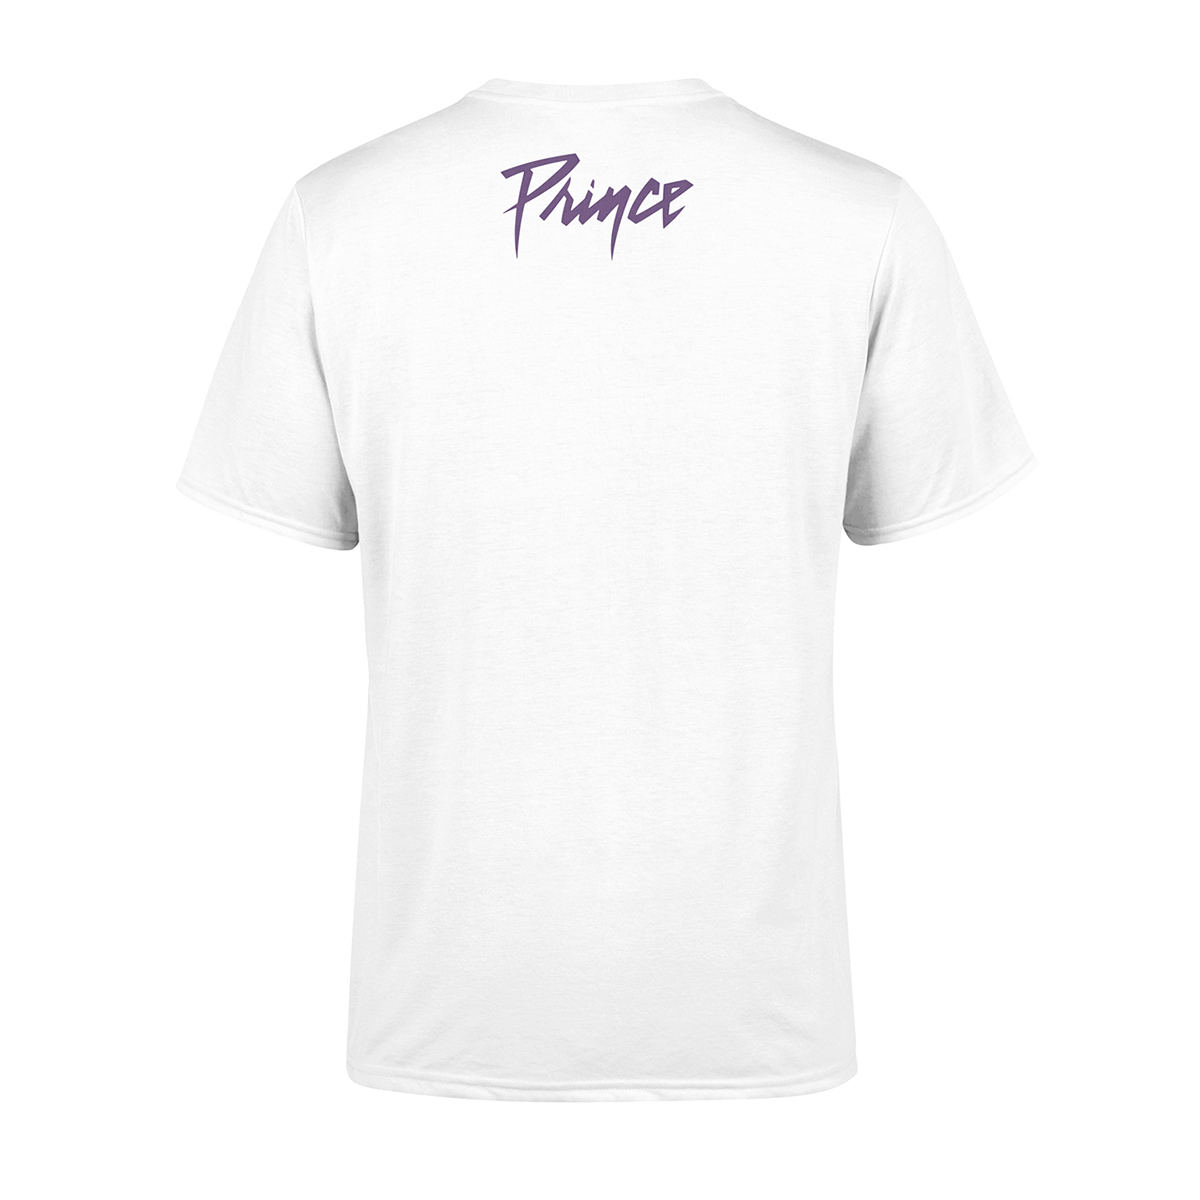 Prince Symbol T-shirt